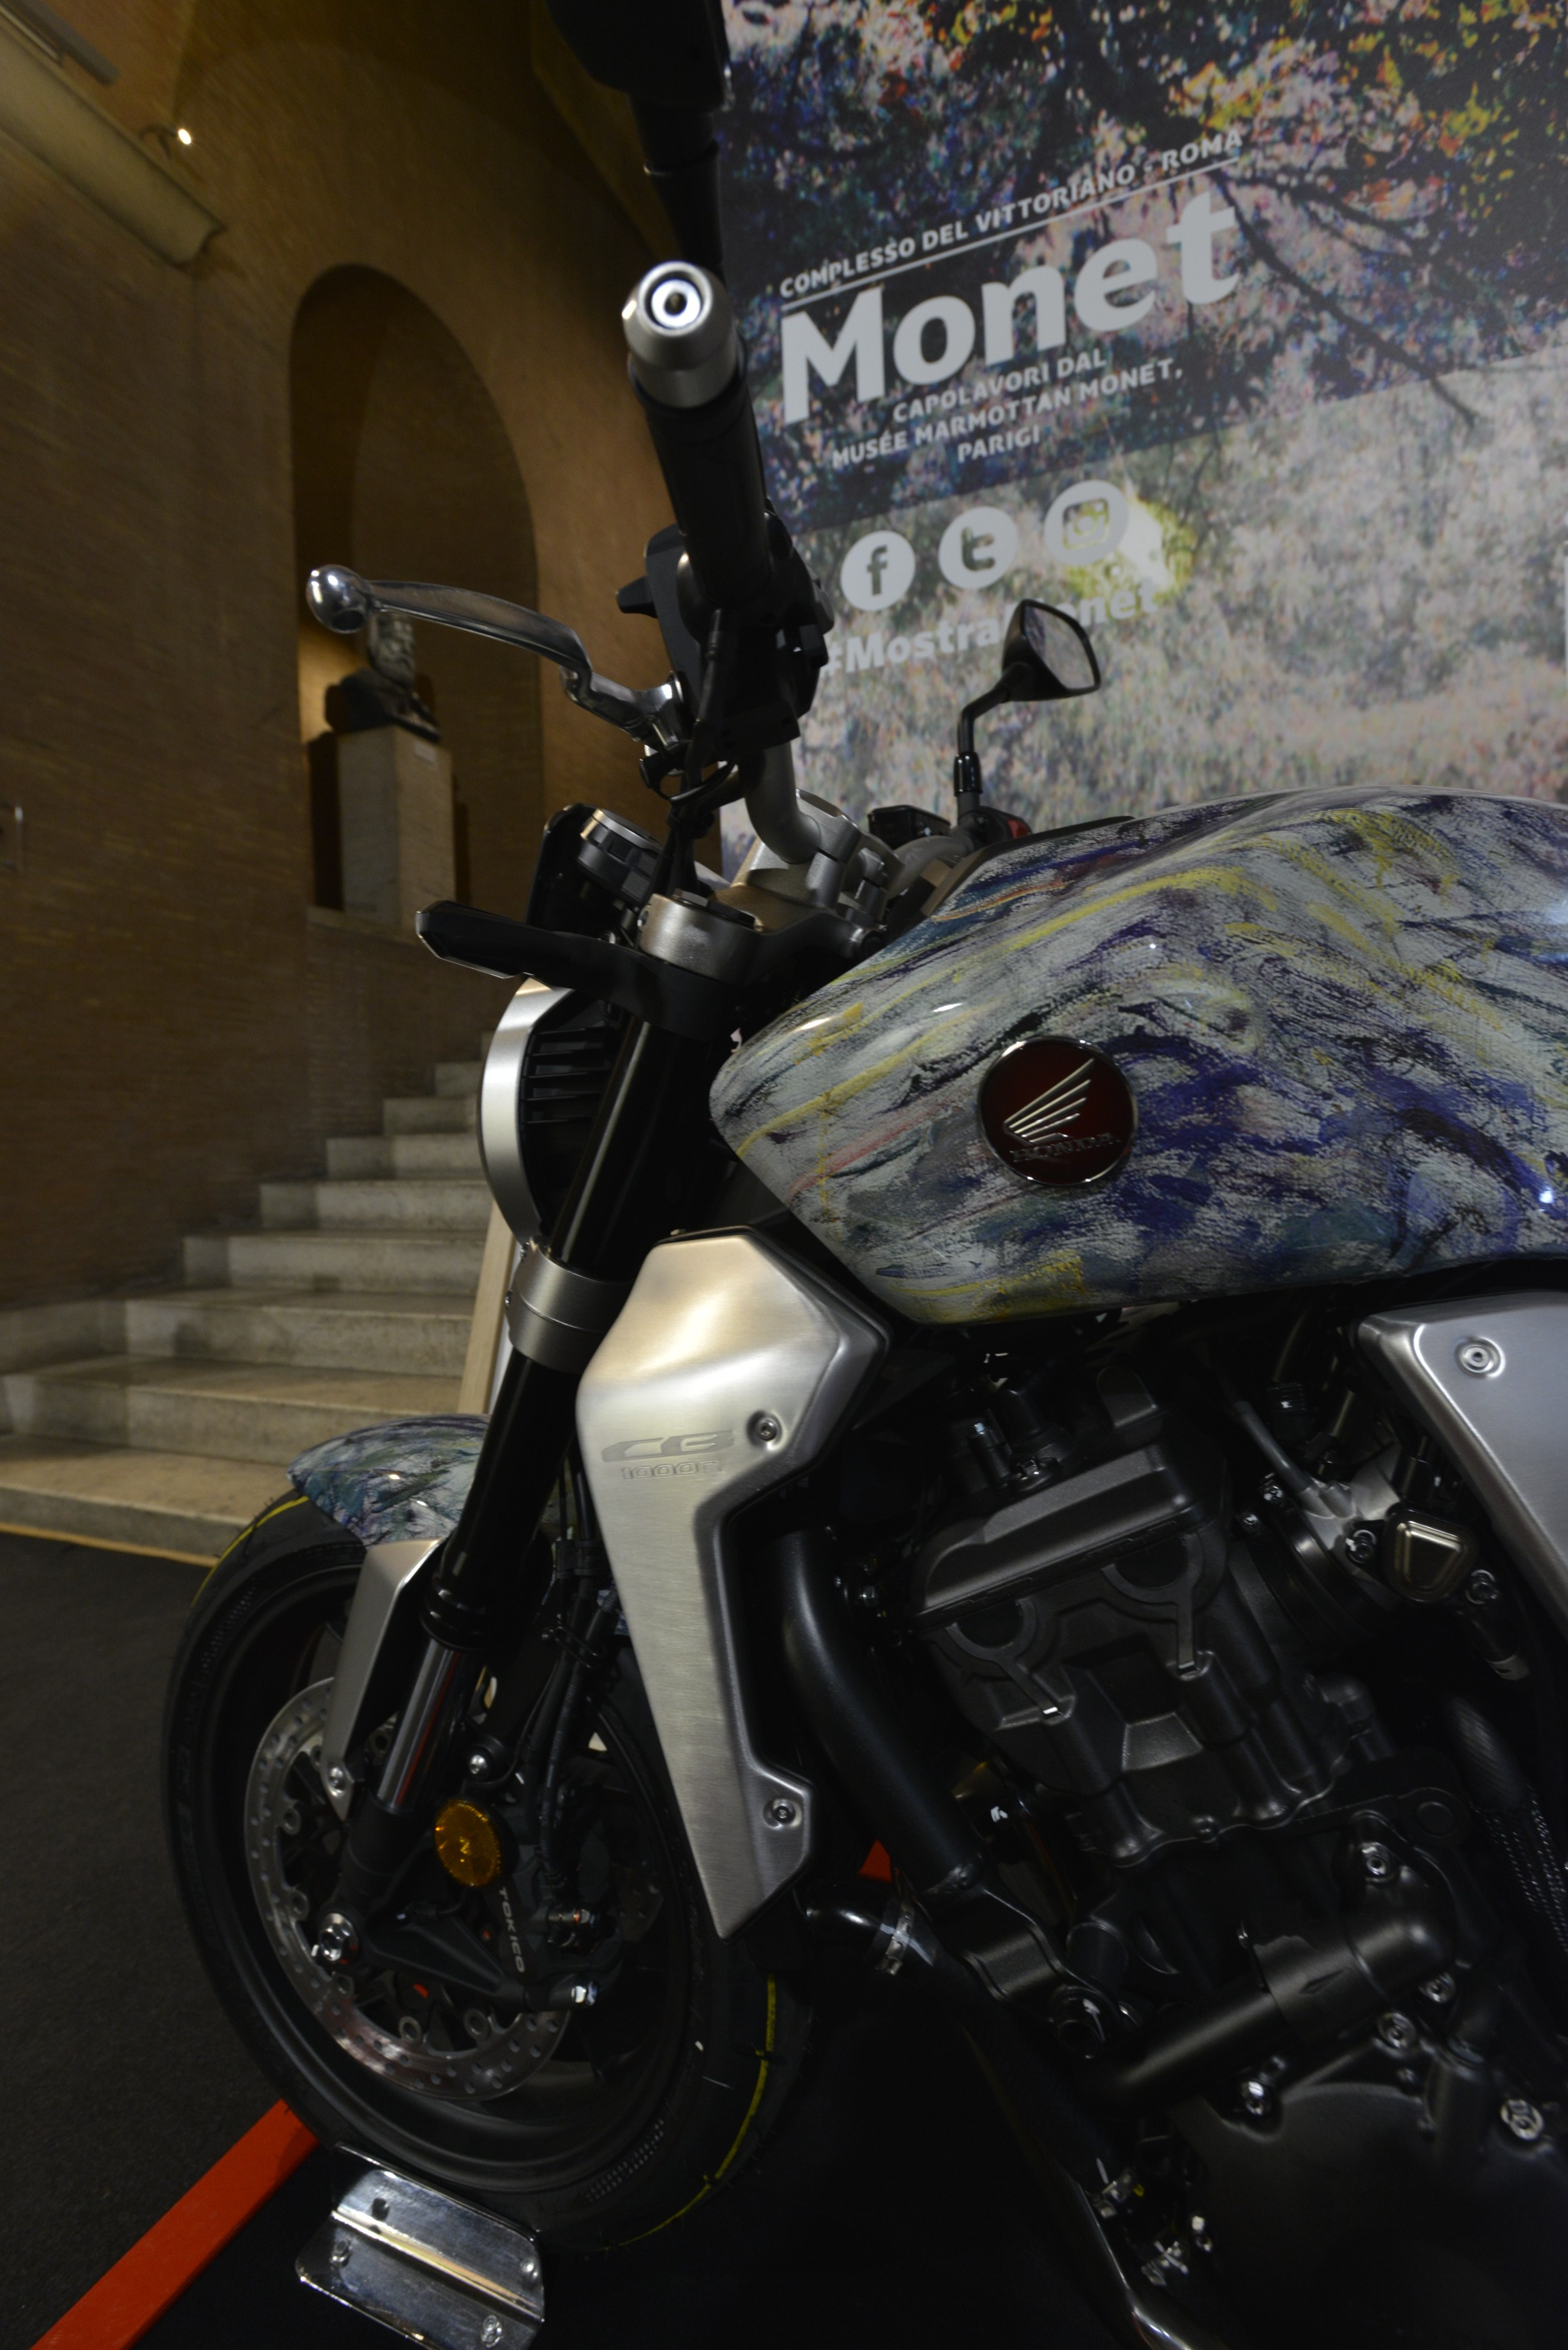 003 -Honda Monet foto iskra coronelli per Arthemisia-2018